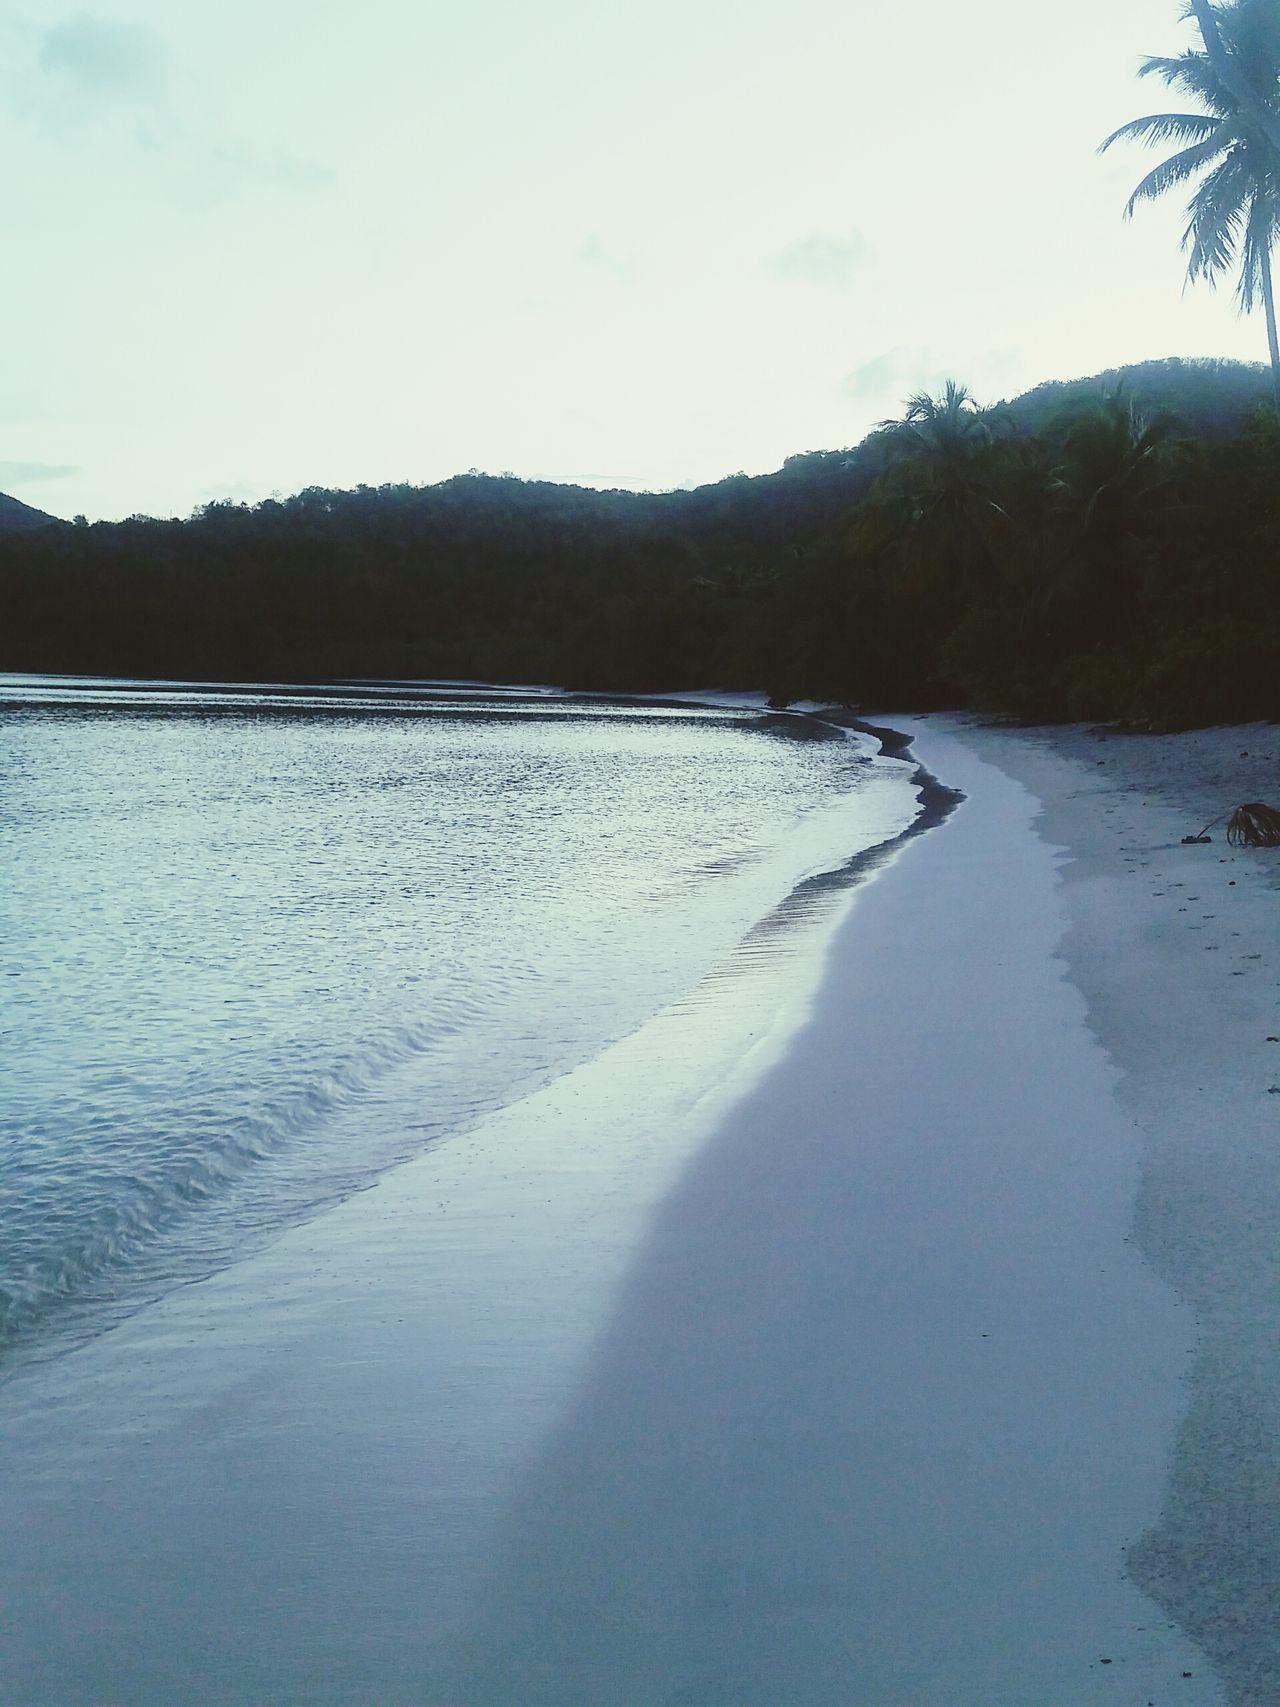 Love Views Love ♥ Water Carribean MahoBay Adventure Outdoors Beauty In Nature Travel Destinations Nature Saint John Virgin Islands Vacations